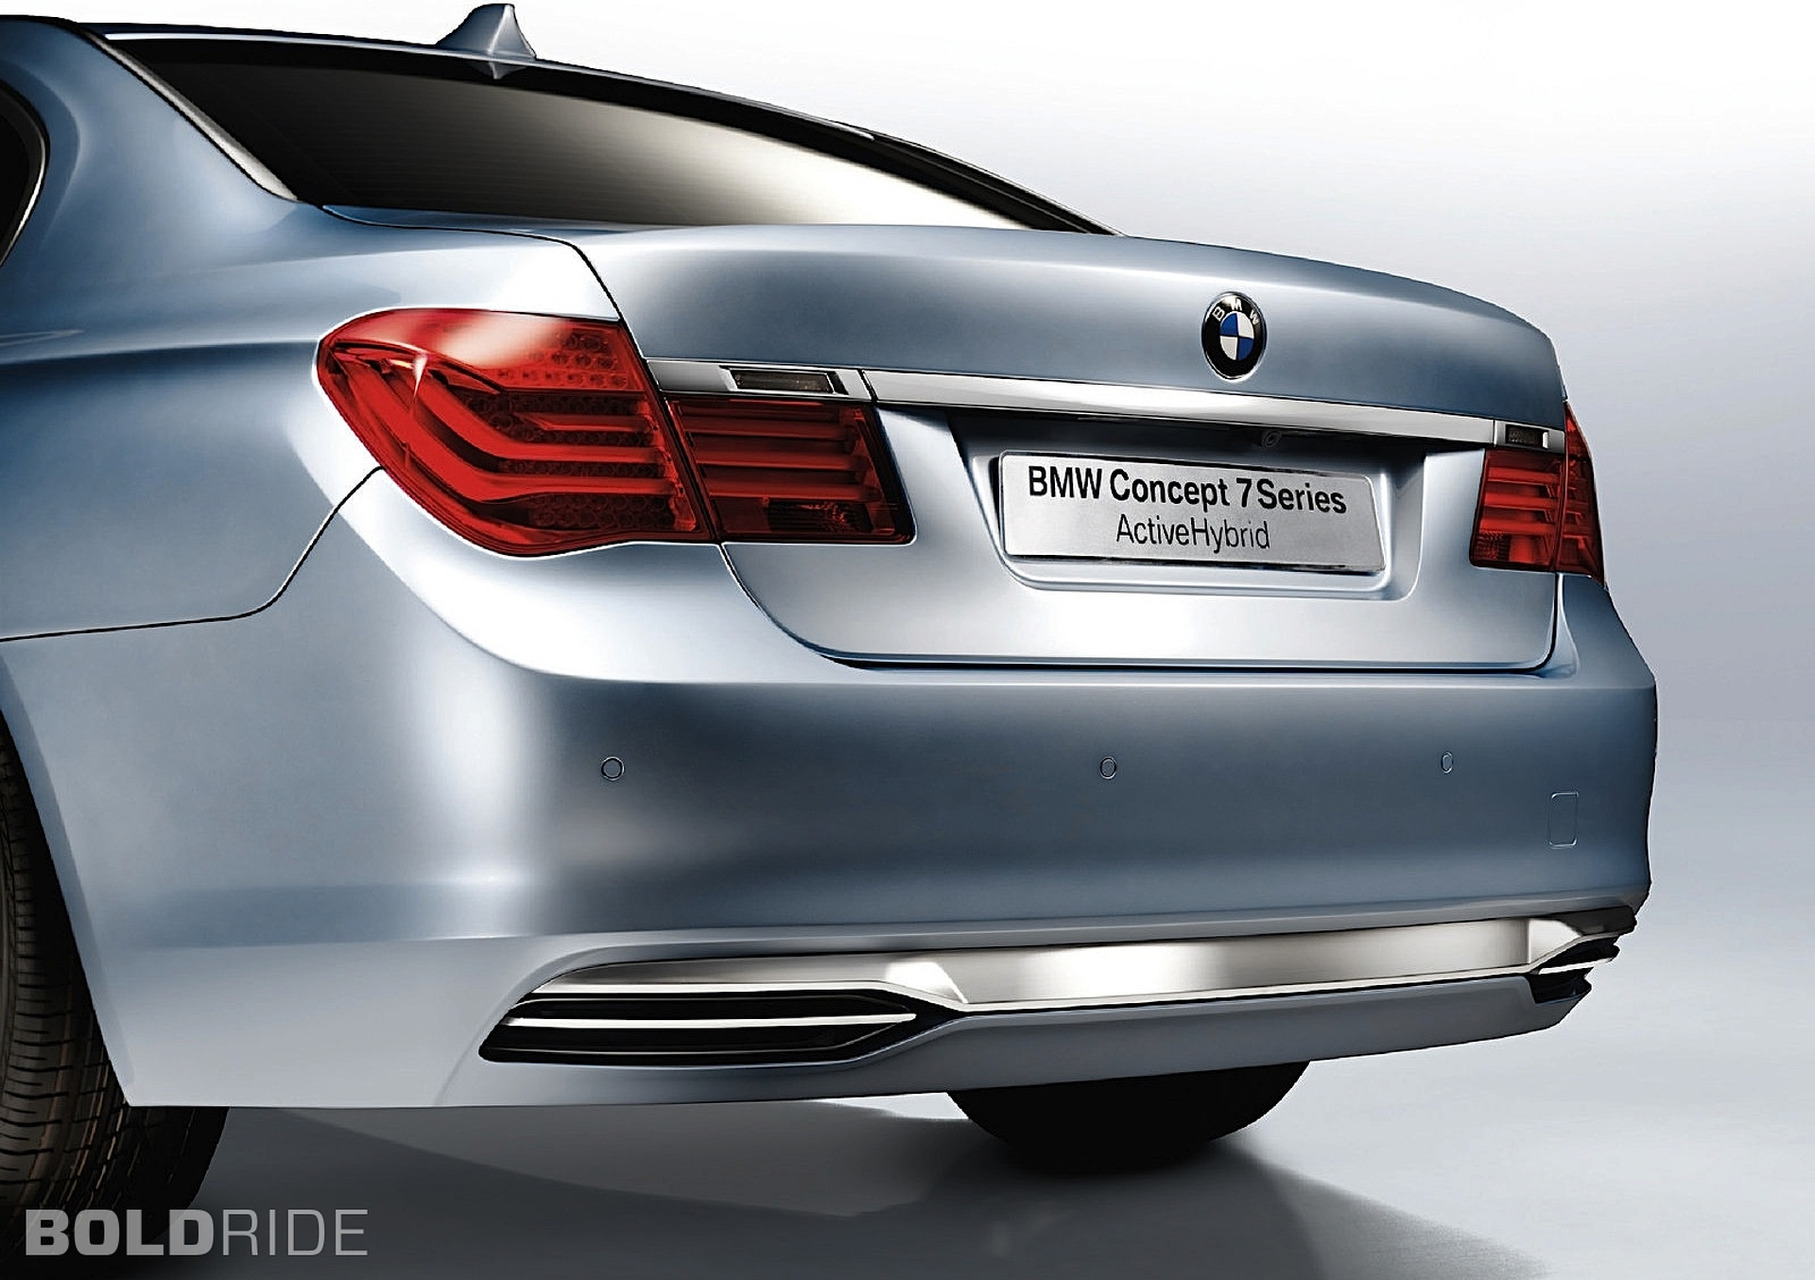 Bmw 7 series activehybrid concept rear angle  № 845091 бесплатно